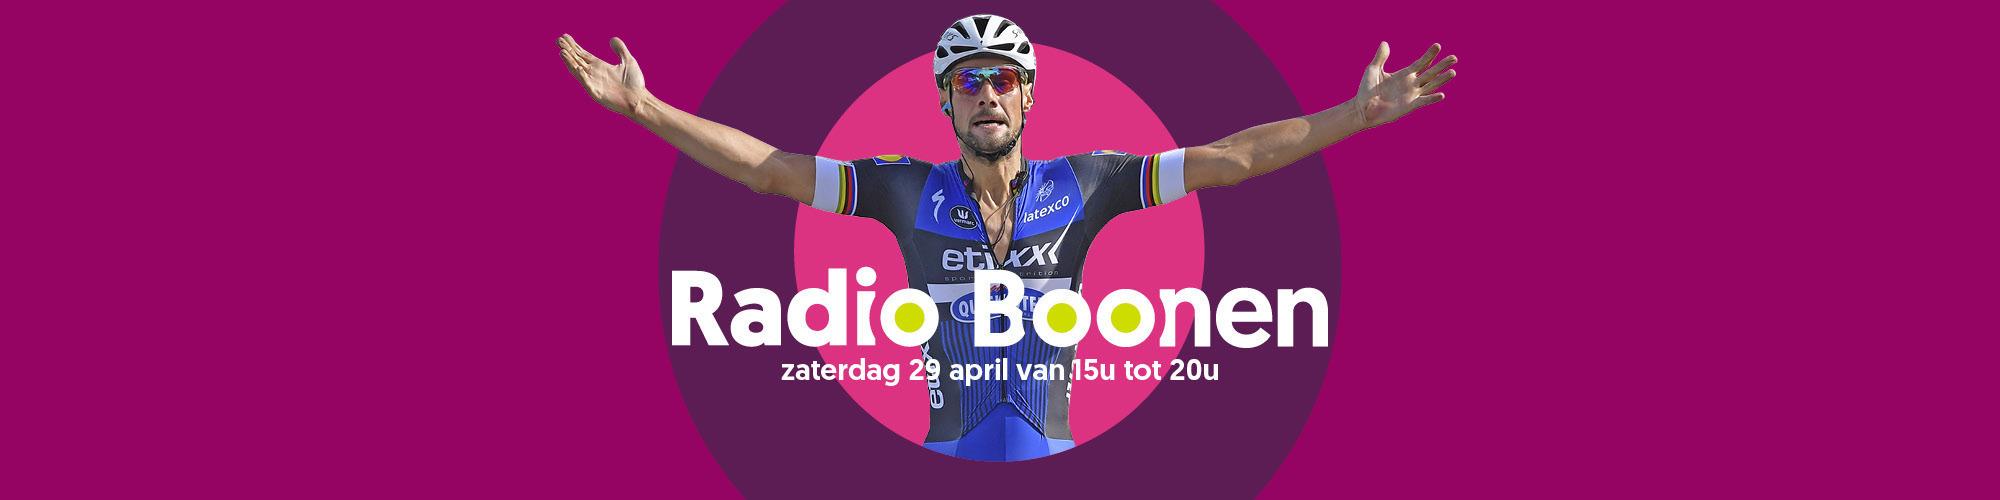 Radio boonen 2000x500 def 0